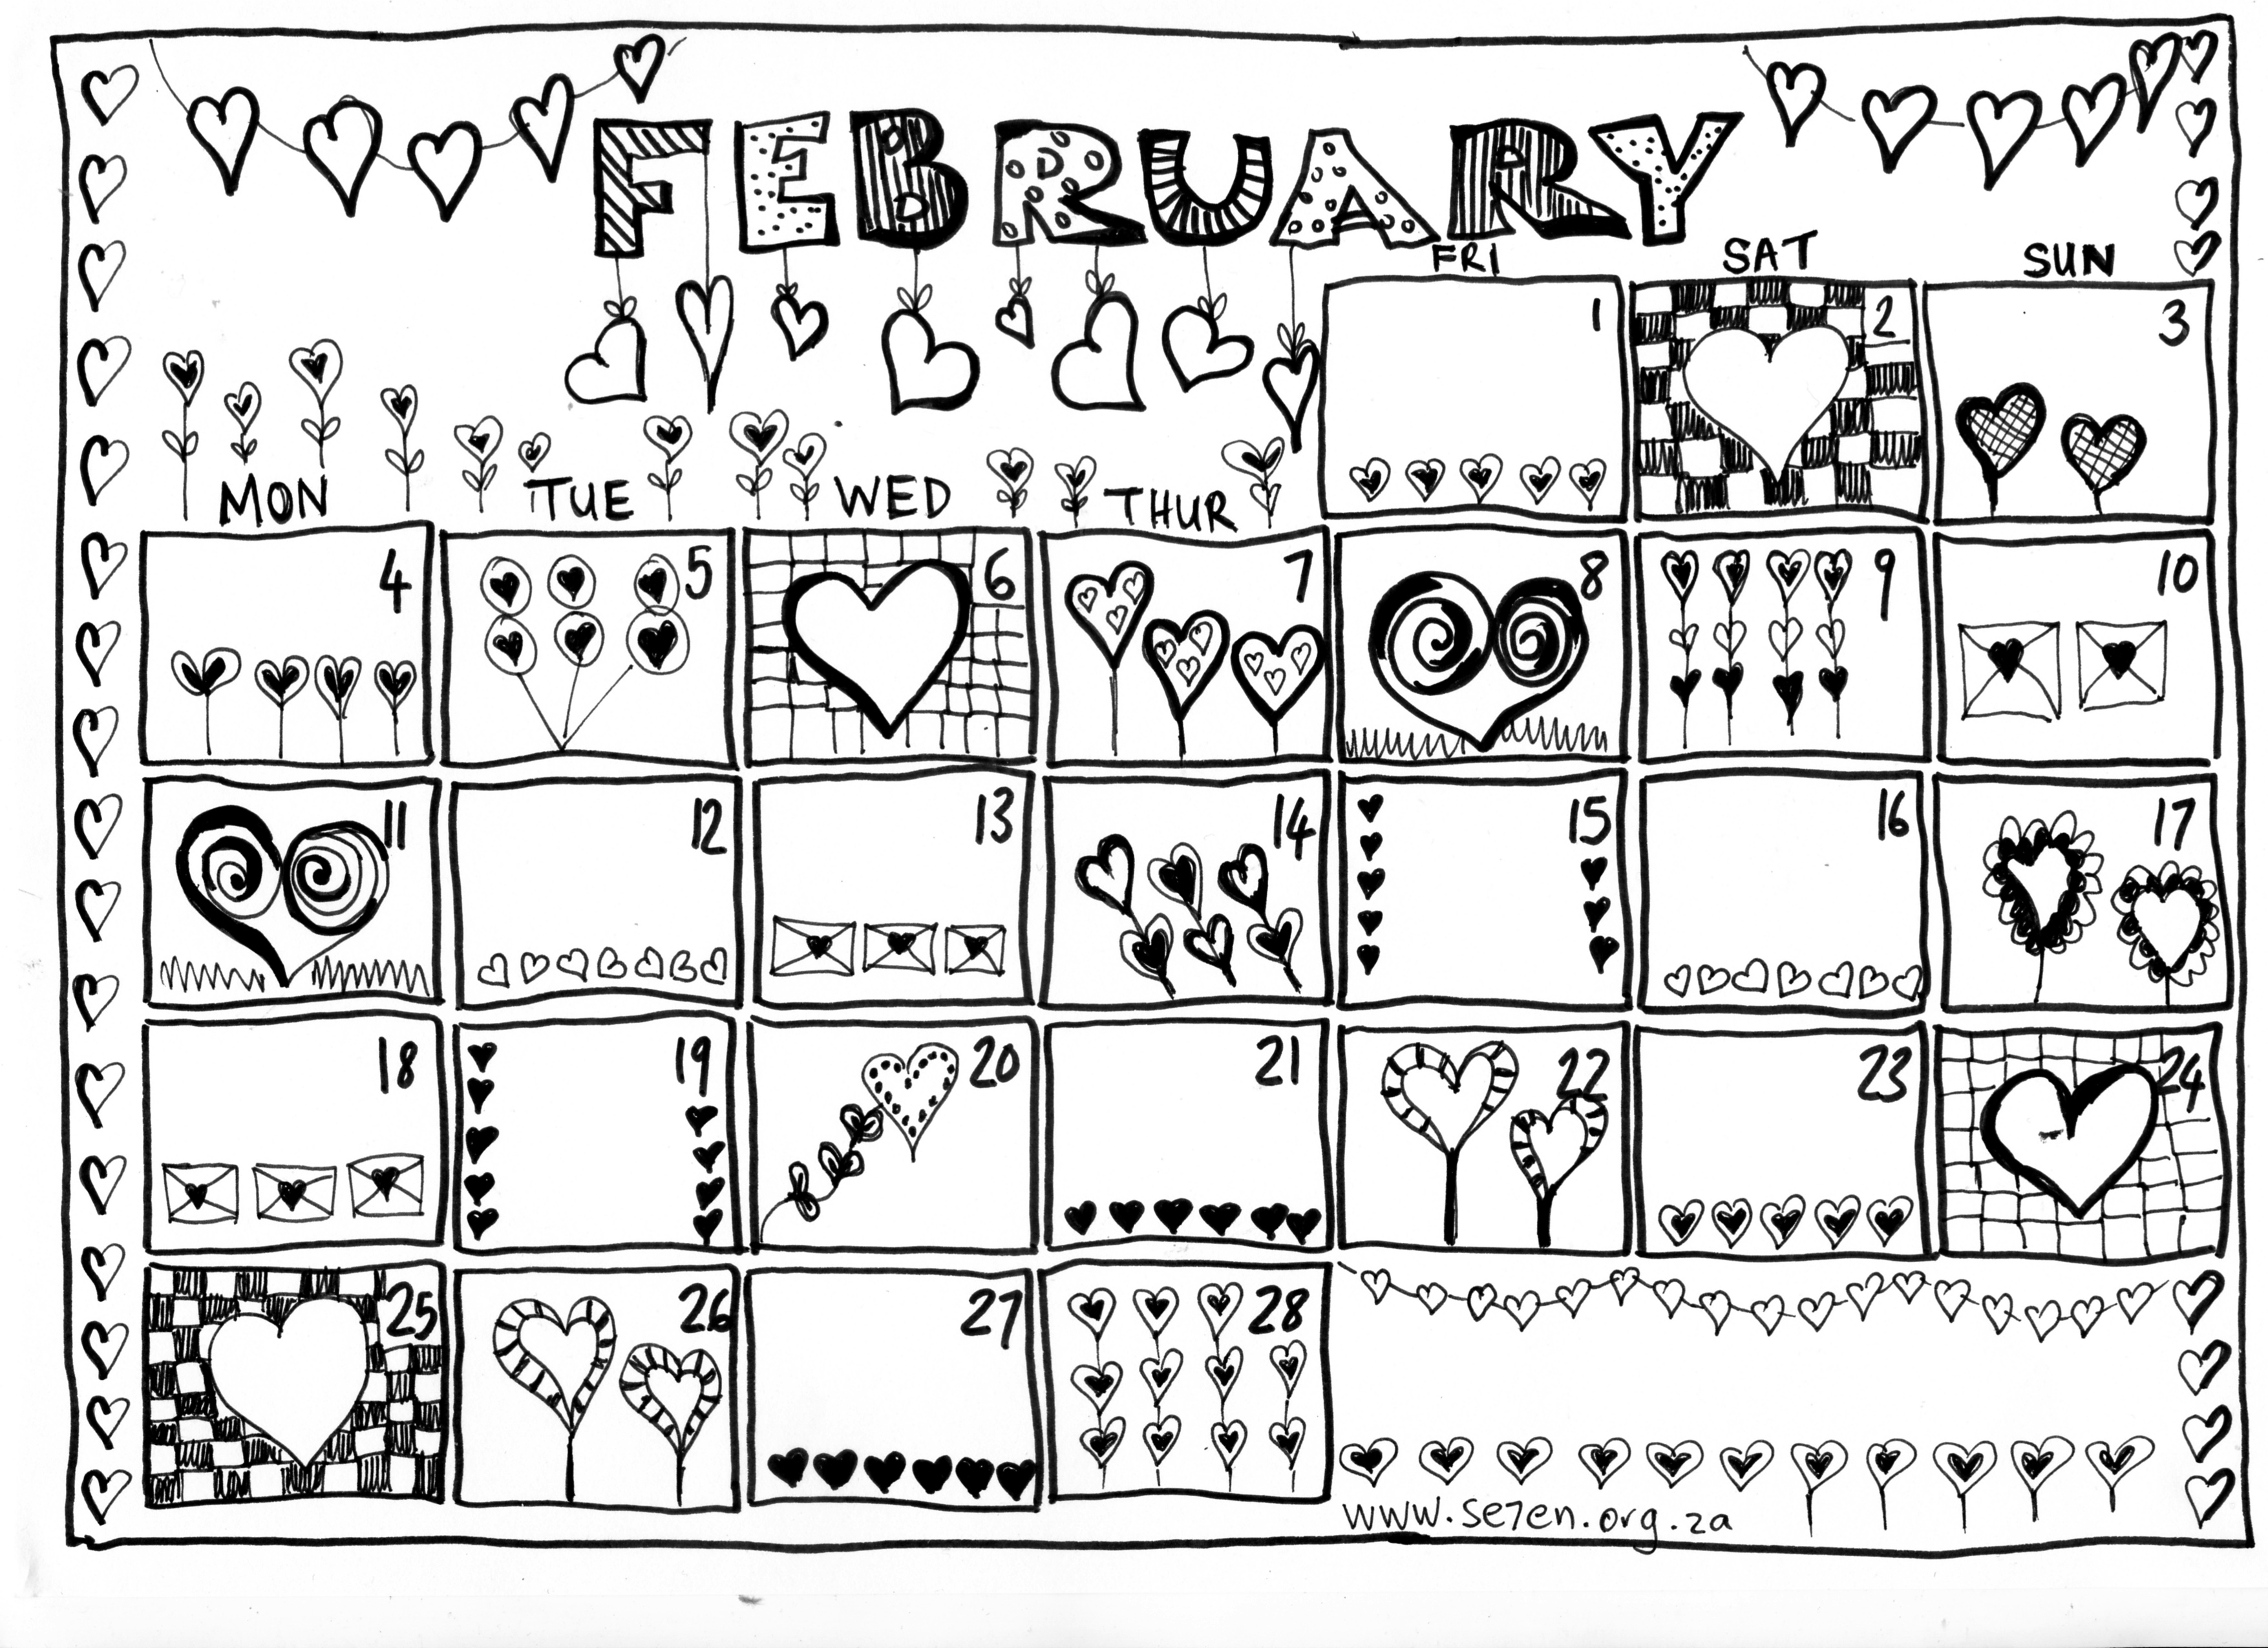 Se7en S February And A Your Free Printable Calendar Se7en